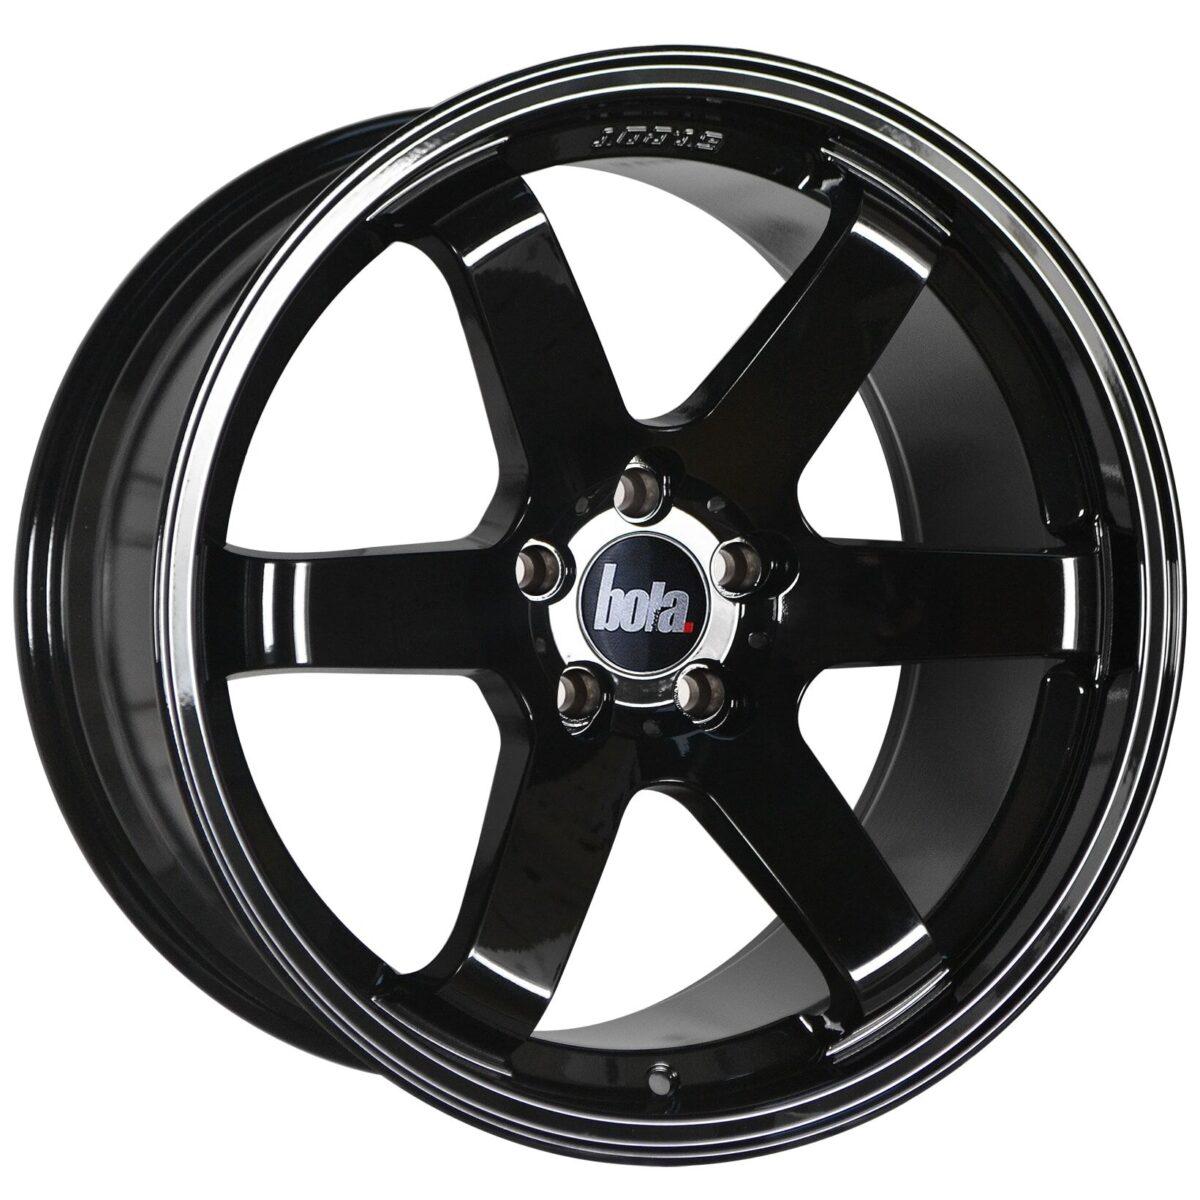 "18"" BOLA B1 Wheels - Gloss Black - VW / Audi / Mercedes - 5x112"